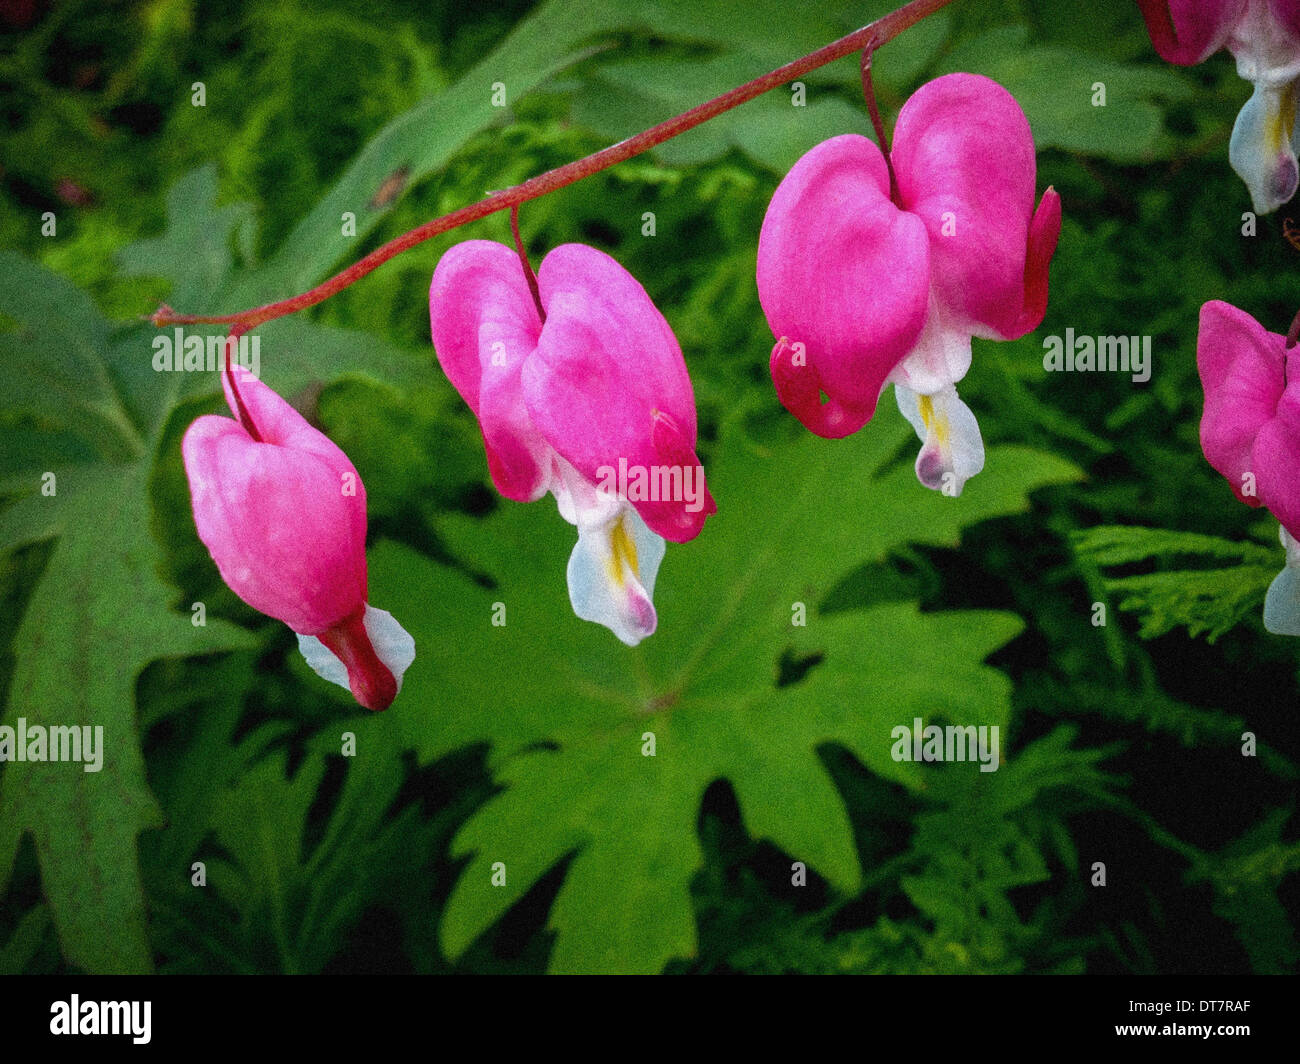 Dicentra Spectabilis Bleeding Heart flowers - Stock Image